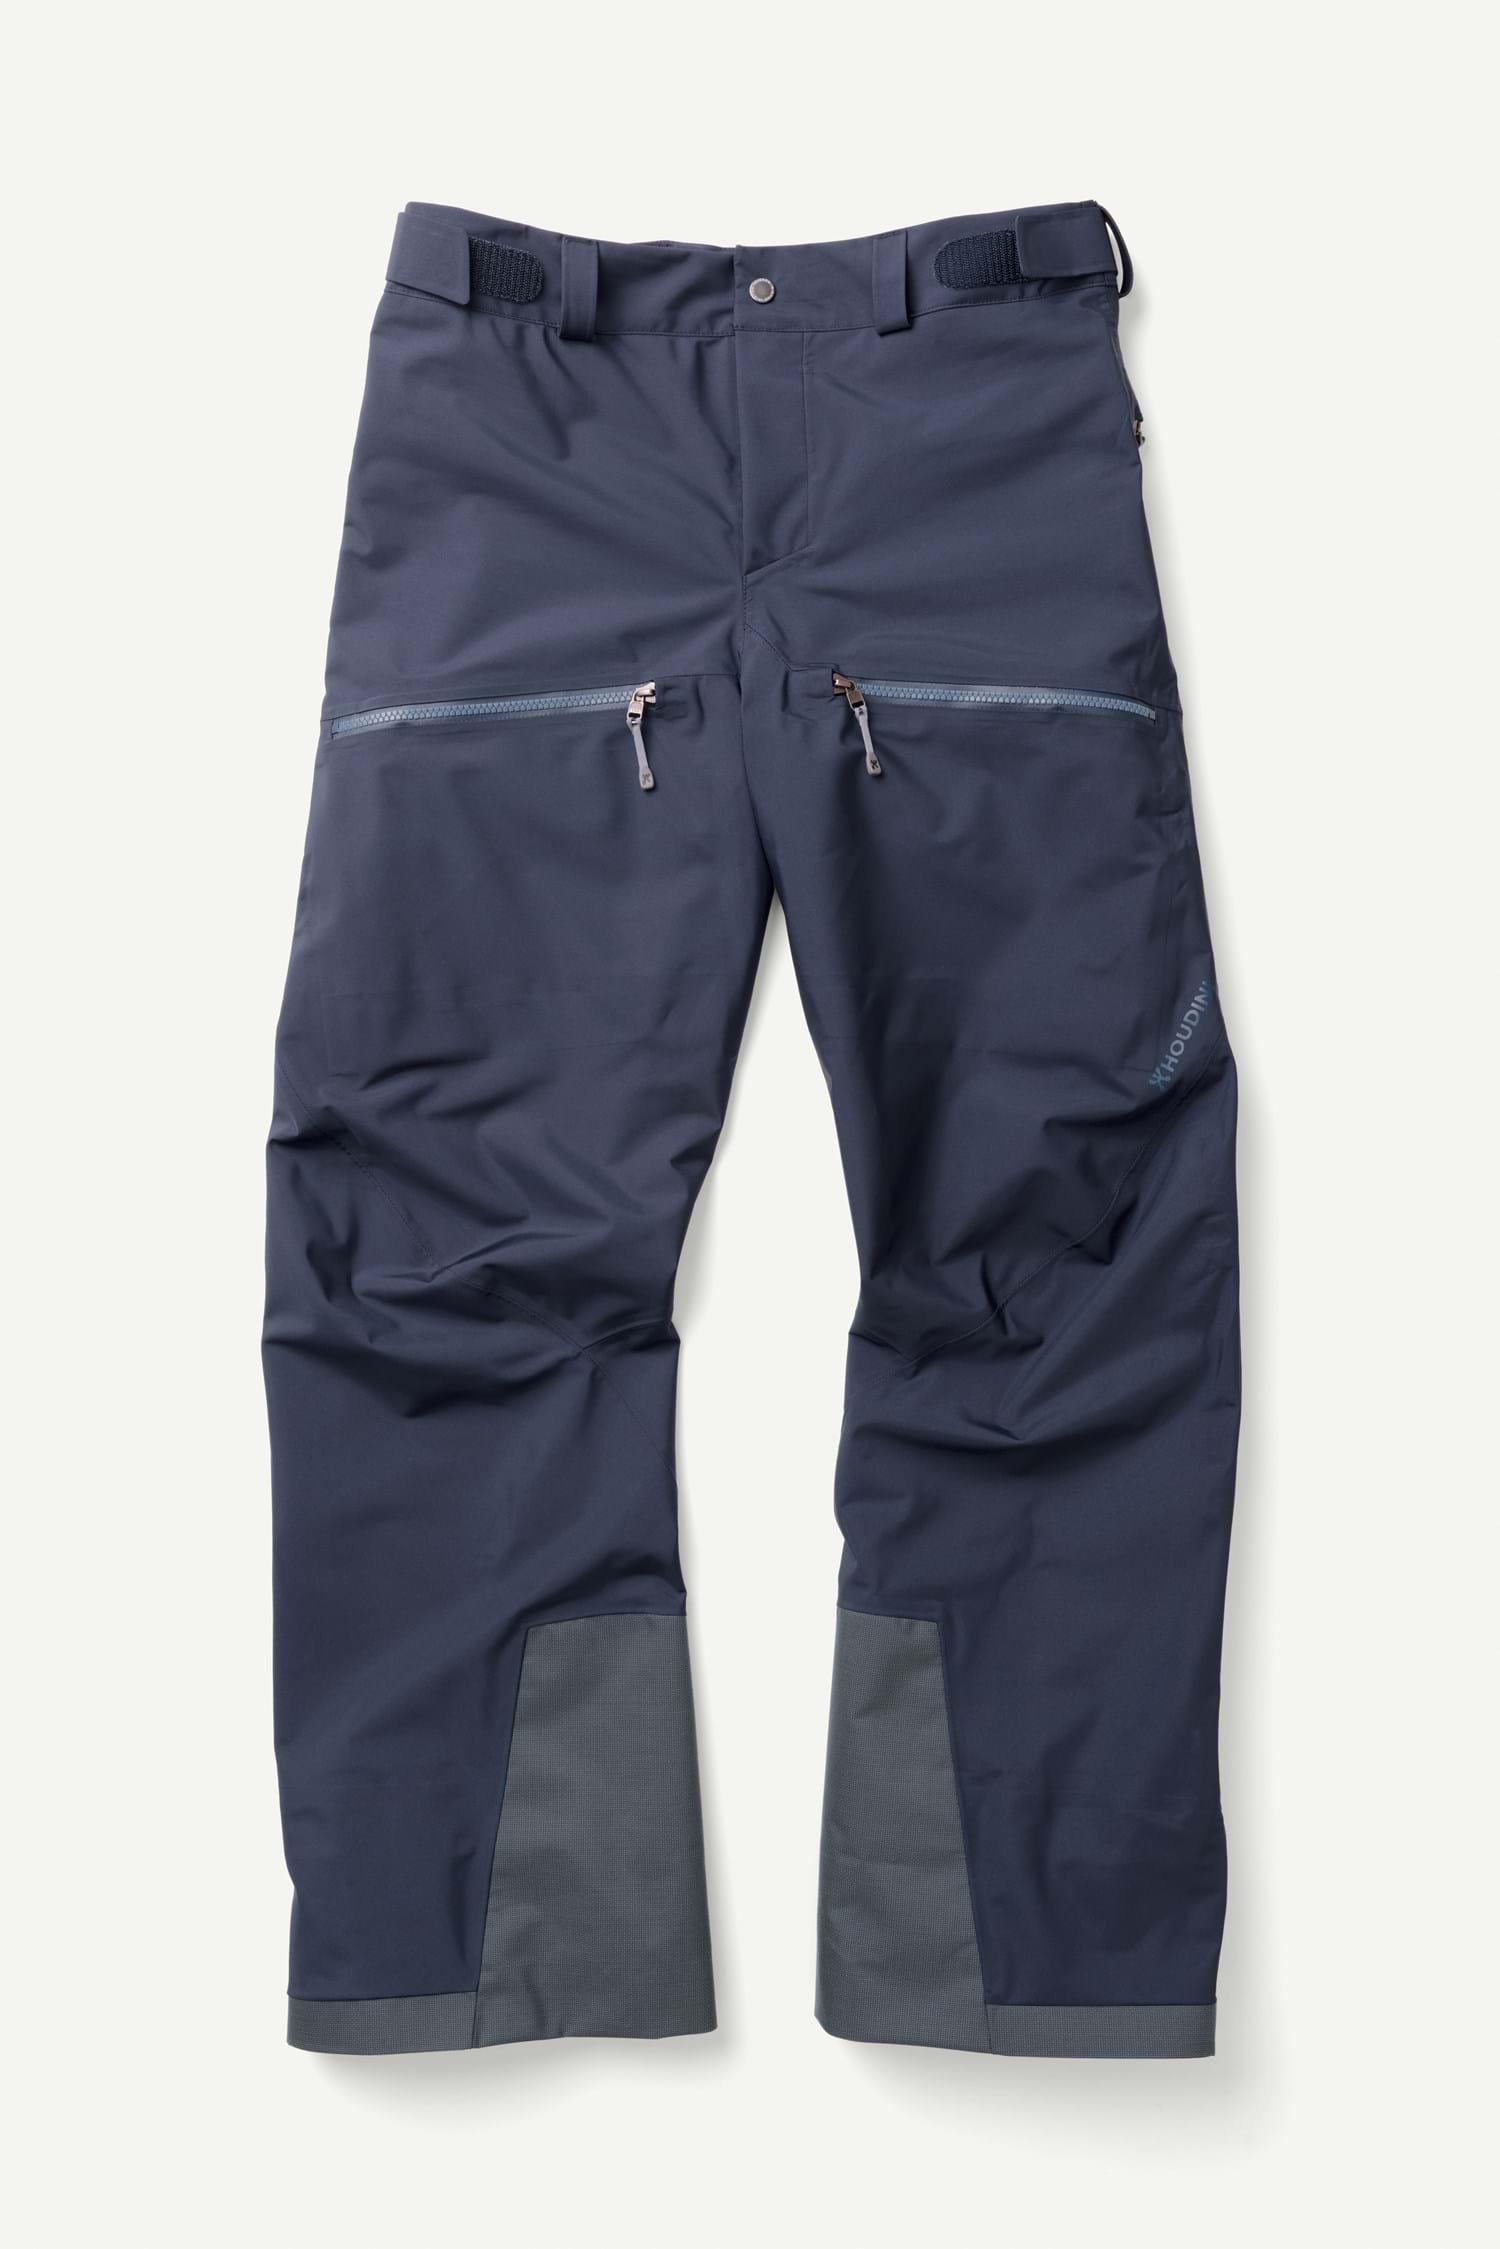 Man/'s New Down Pants Nylon Warm Jogging Wet-look Winter Training Long Trousers